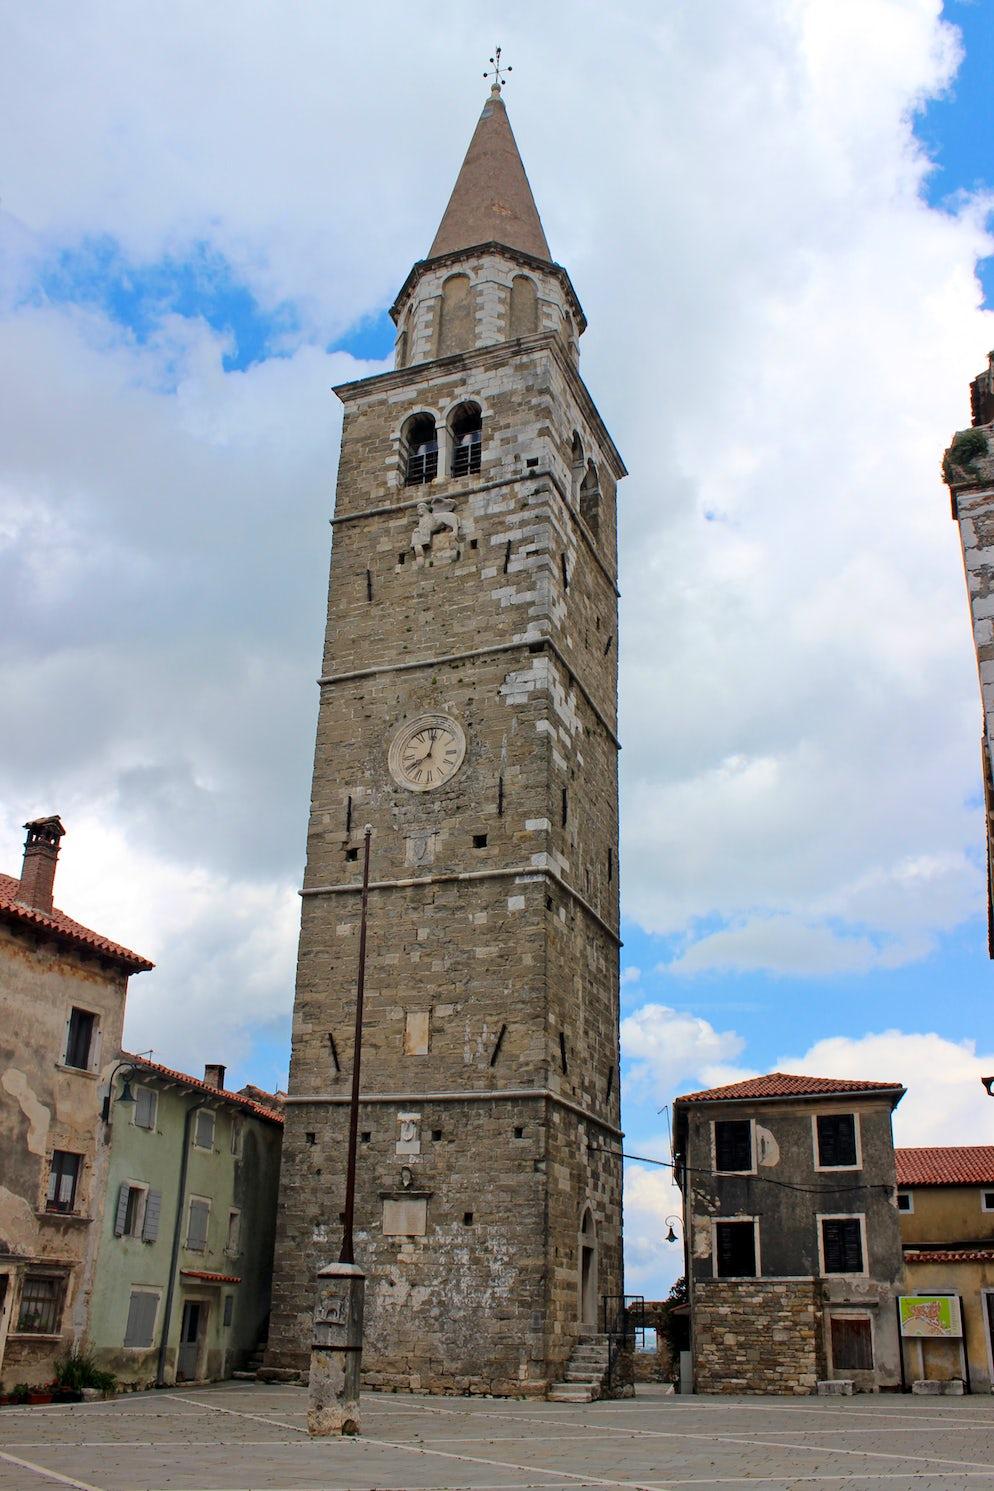 Bell-tower, San Servolo, Buje; Photo © credits: Maesi64